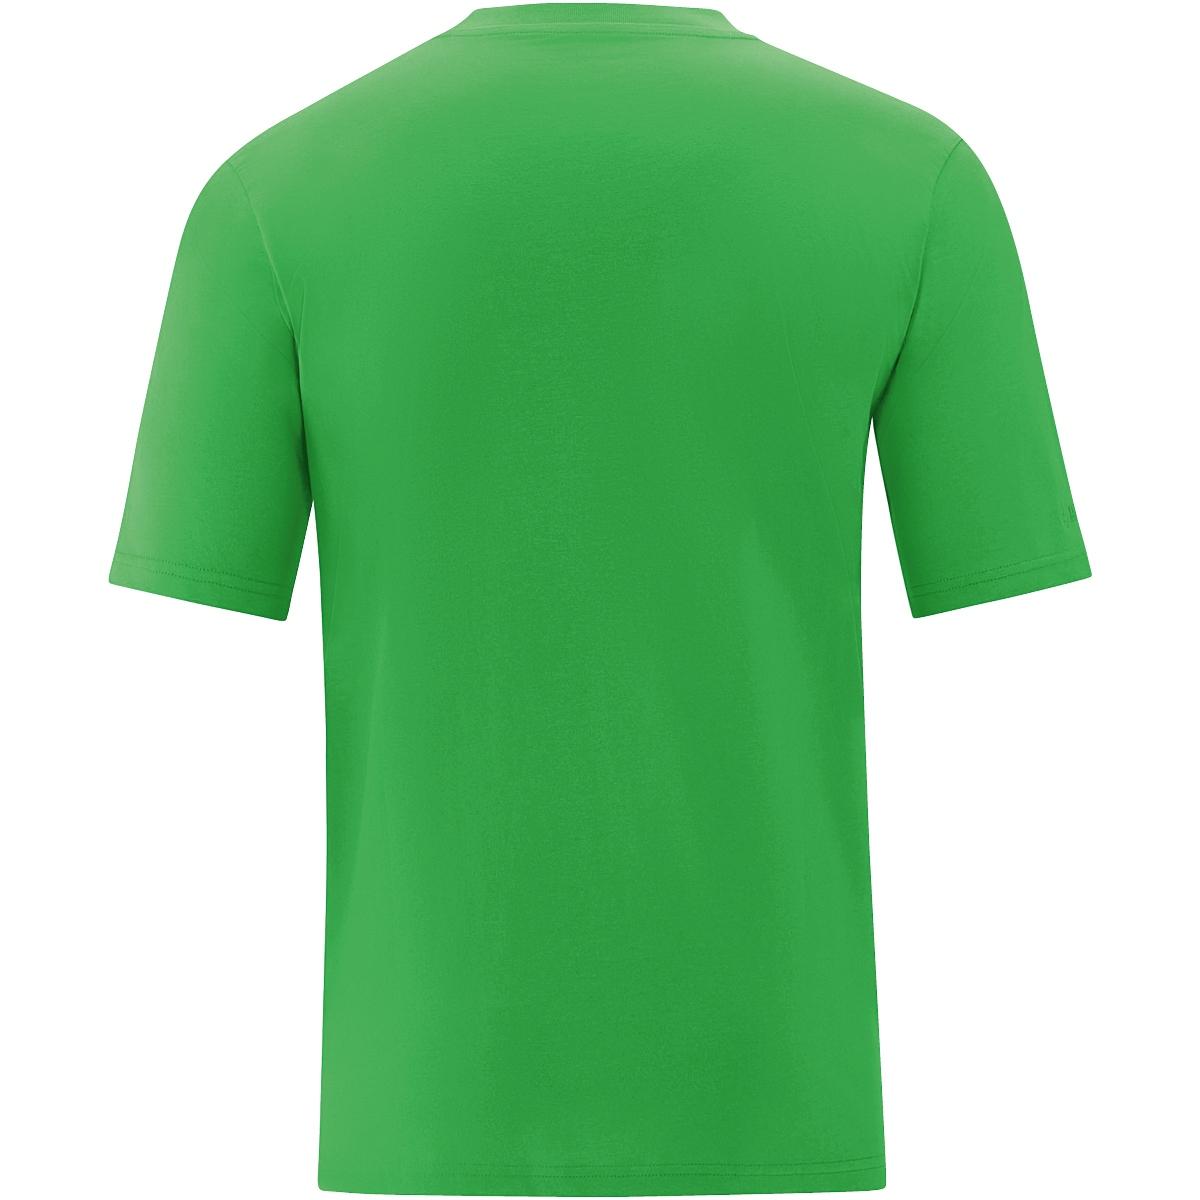 Jako Polo Classic Herren anthrazit meliert Poloshirt Shirt T-Shirt  Sport Fitnes